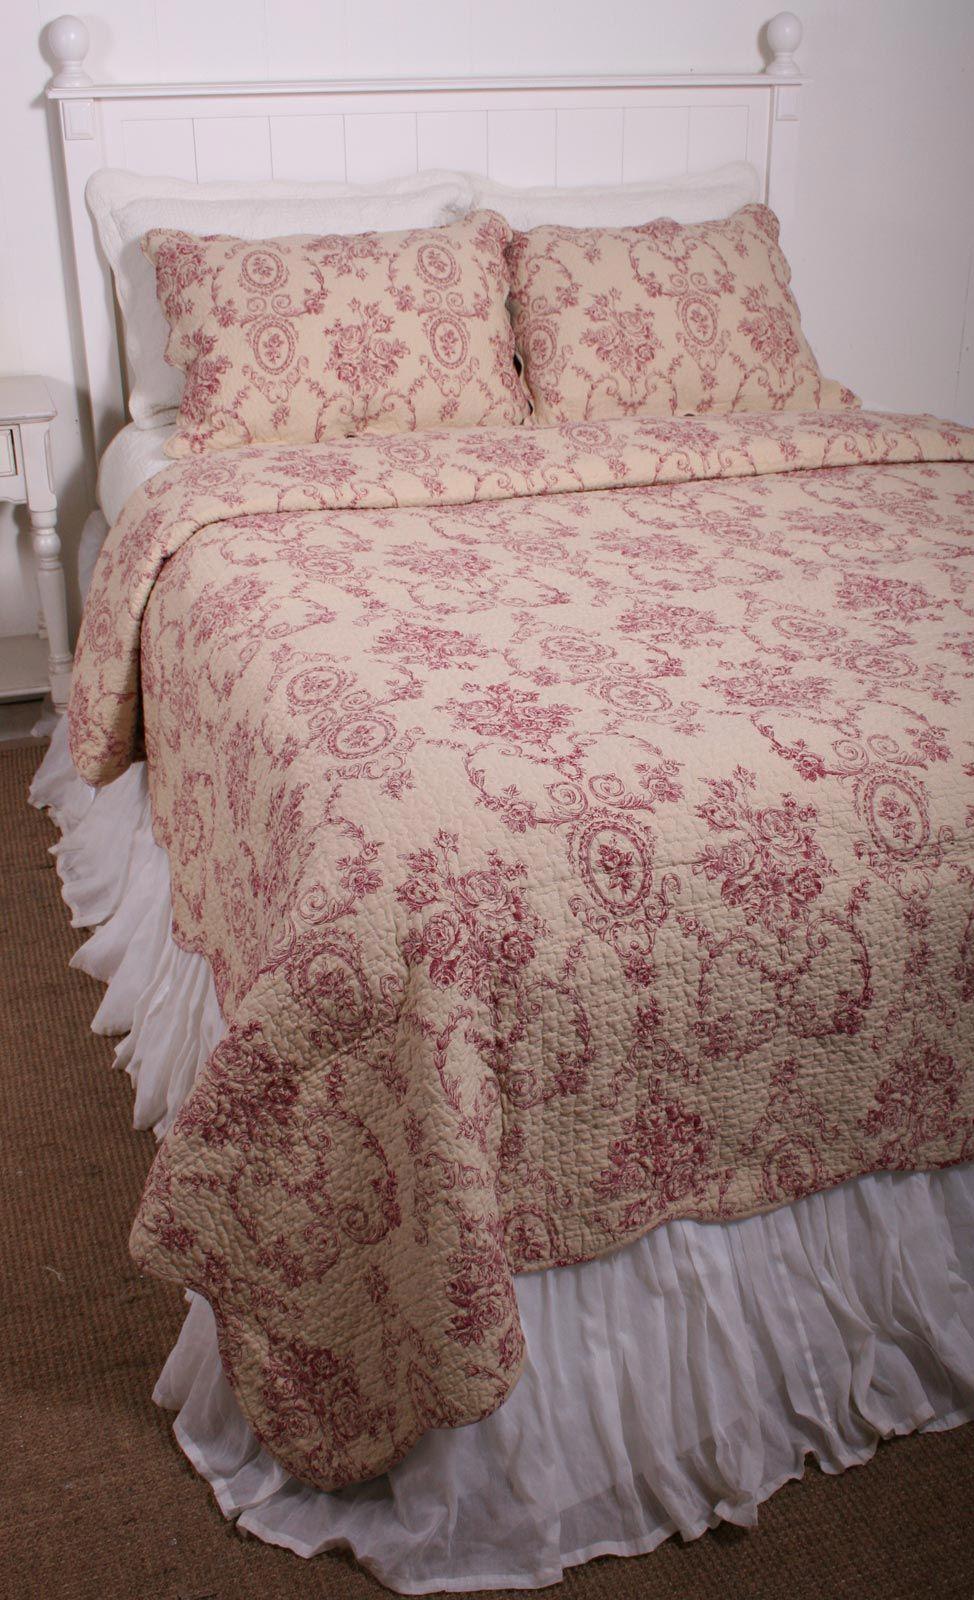 Floral Urn Toile Burgundy Red Ecru Cotton Quilt Set   Decor ...